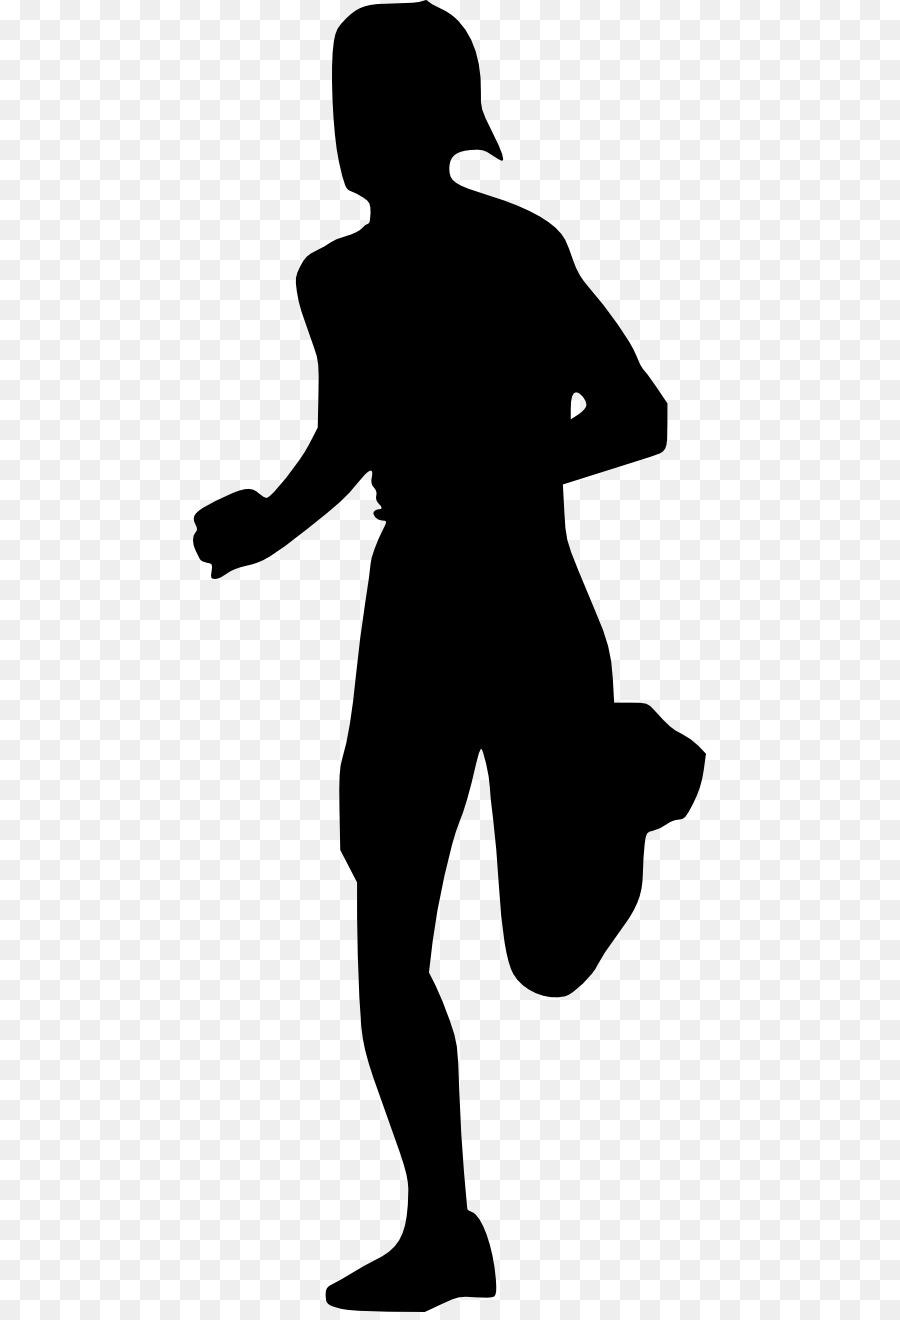 Saya setsuna bigfoot stiker decal running man